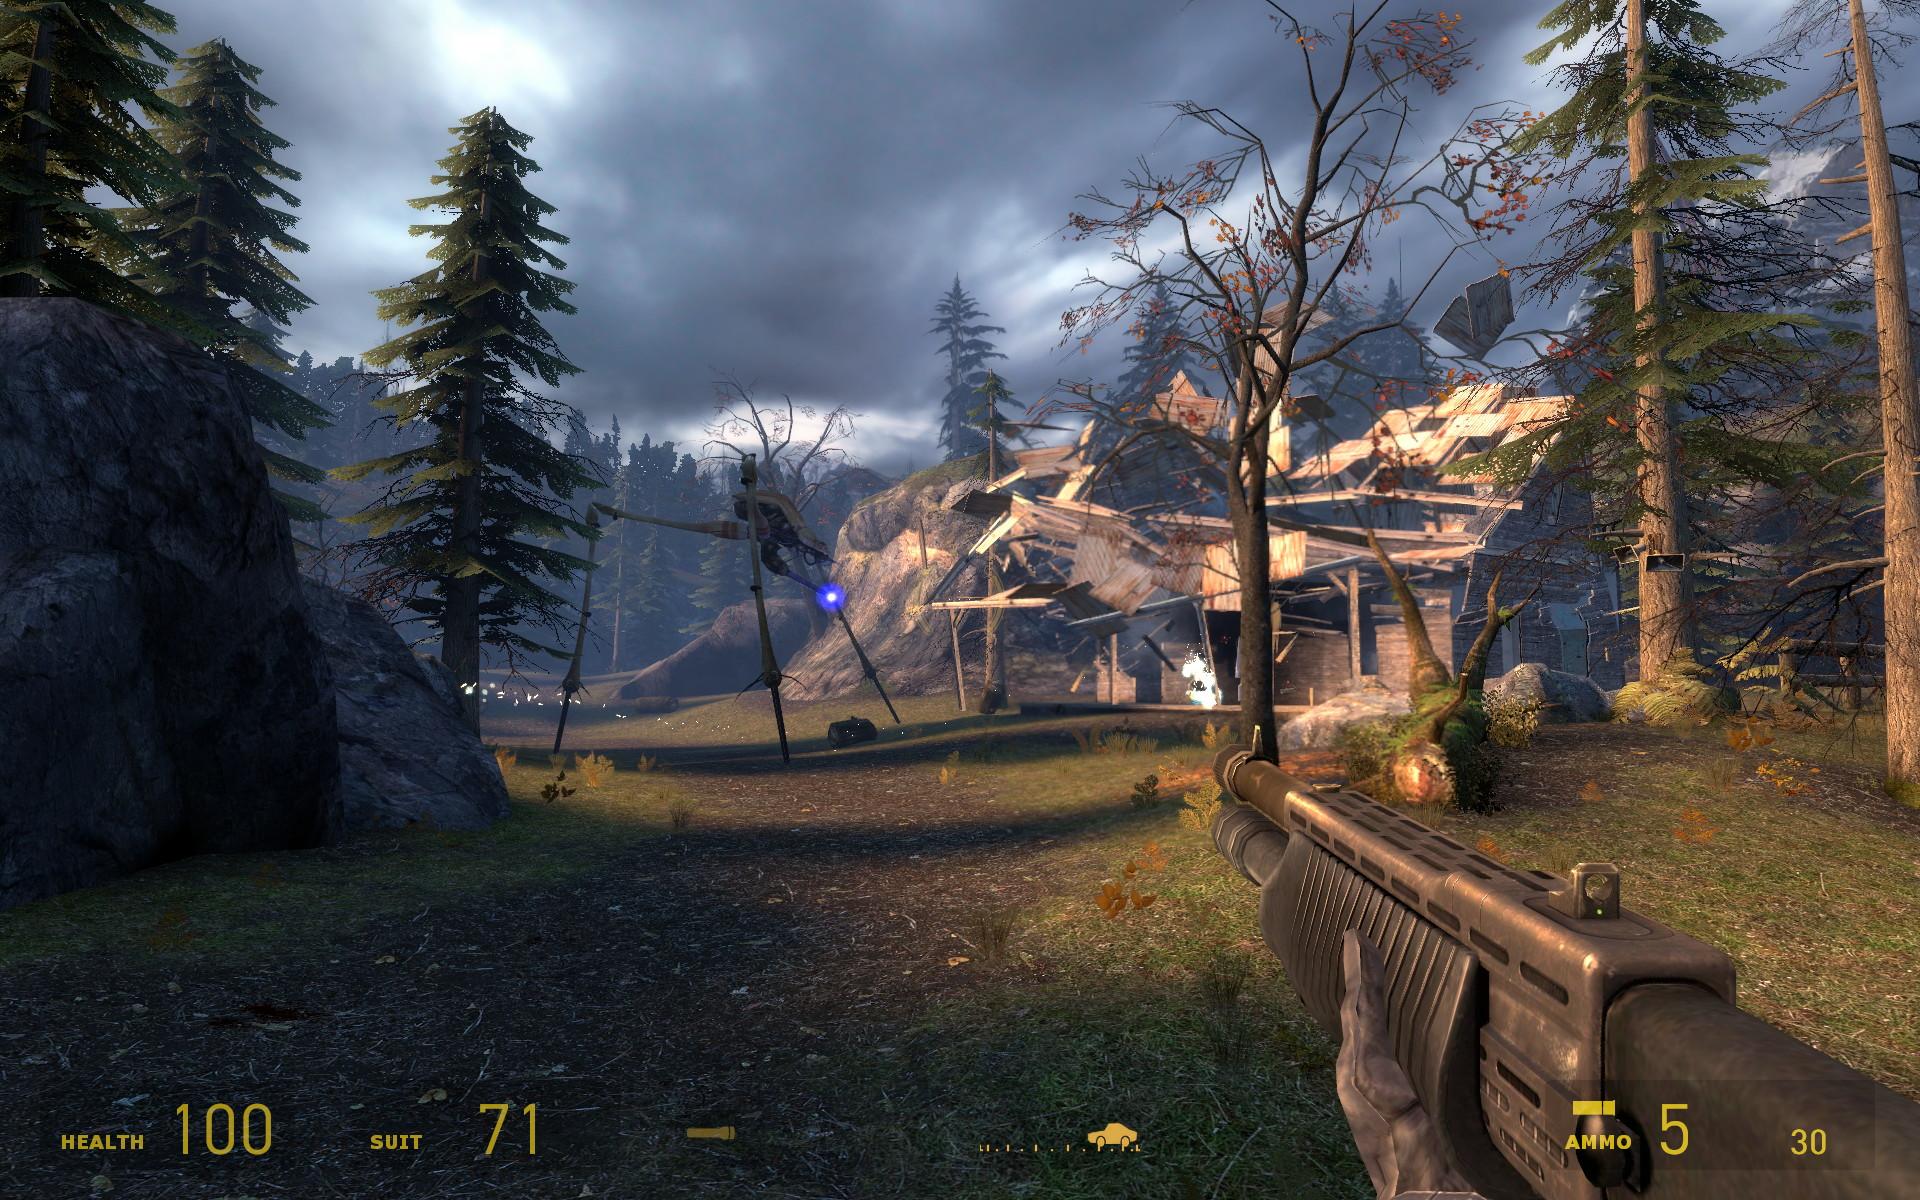 Half Life 2 Vr Gets New Teaser Trailer Mod To Release Soon